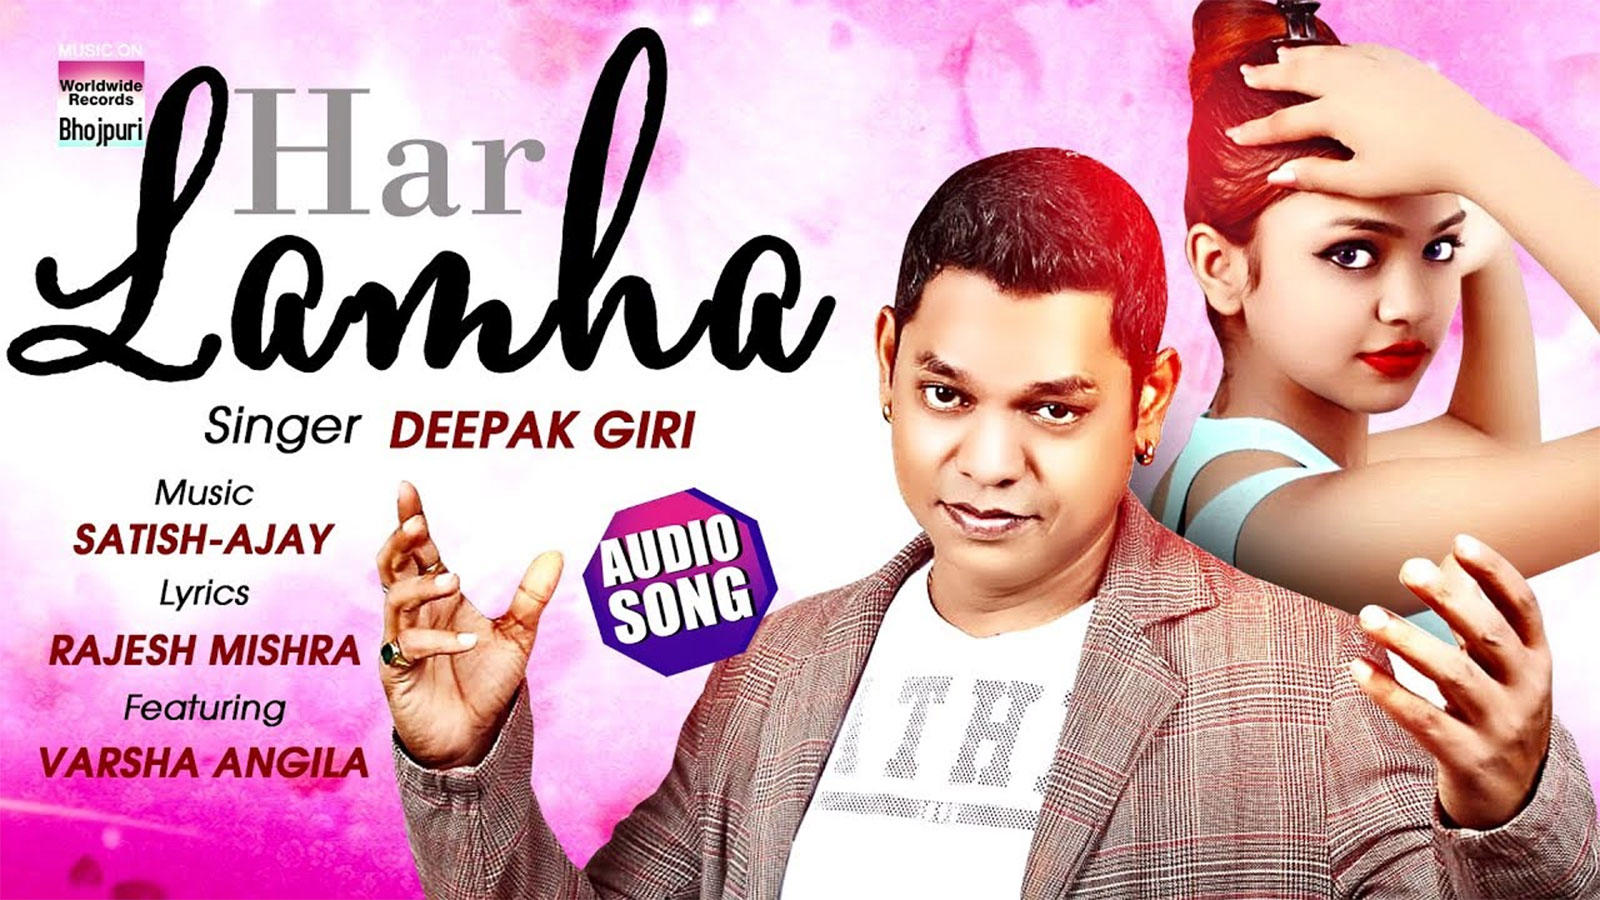 Latest Bhojpuri Song 'Har Lamha' Sung By Deepak Giri